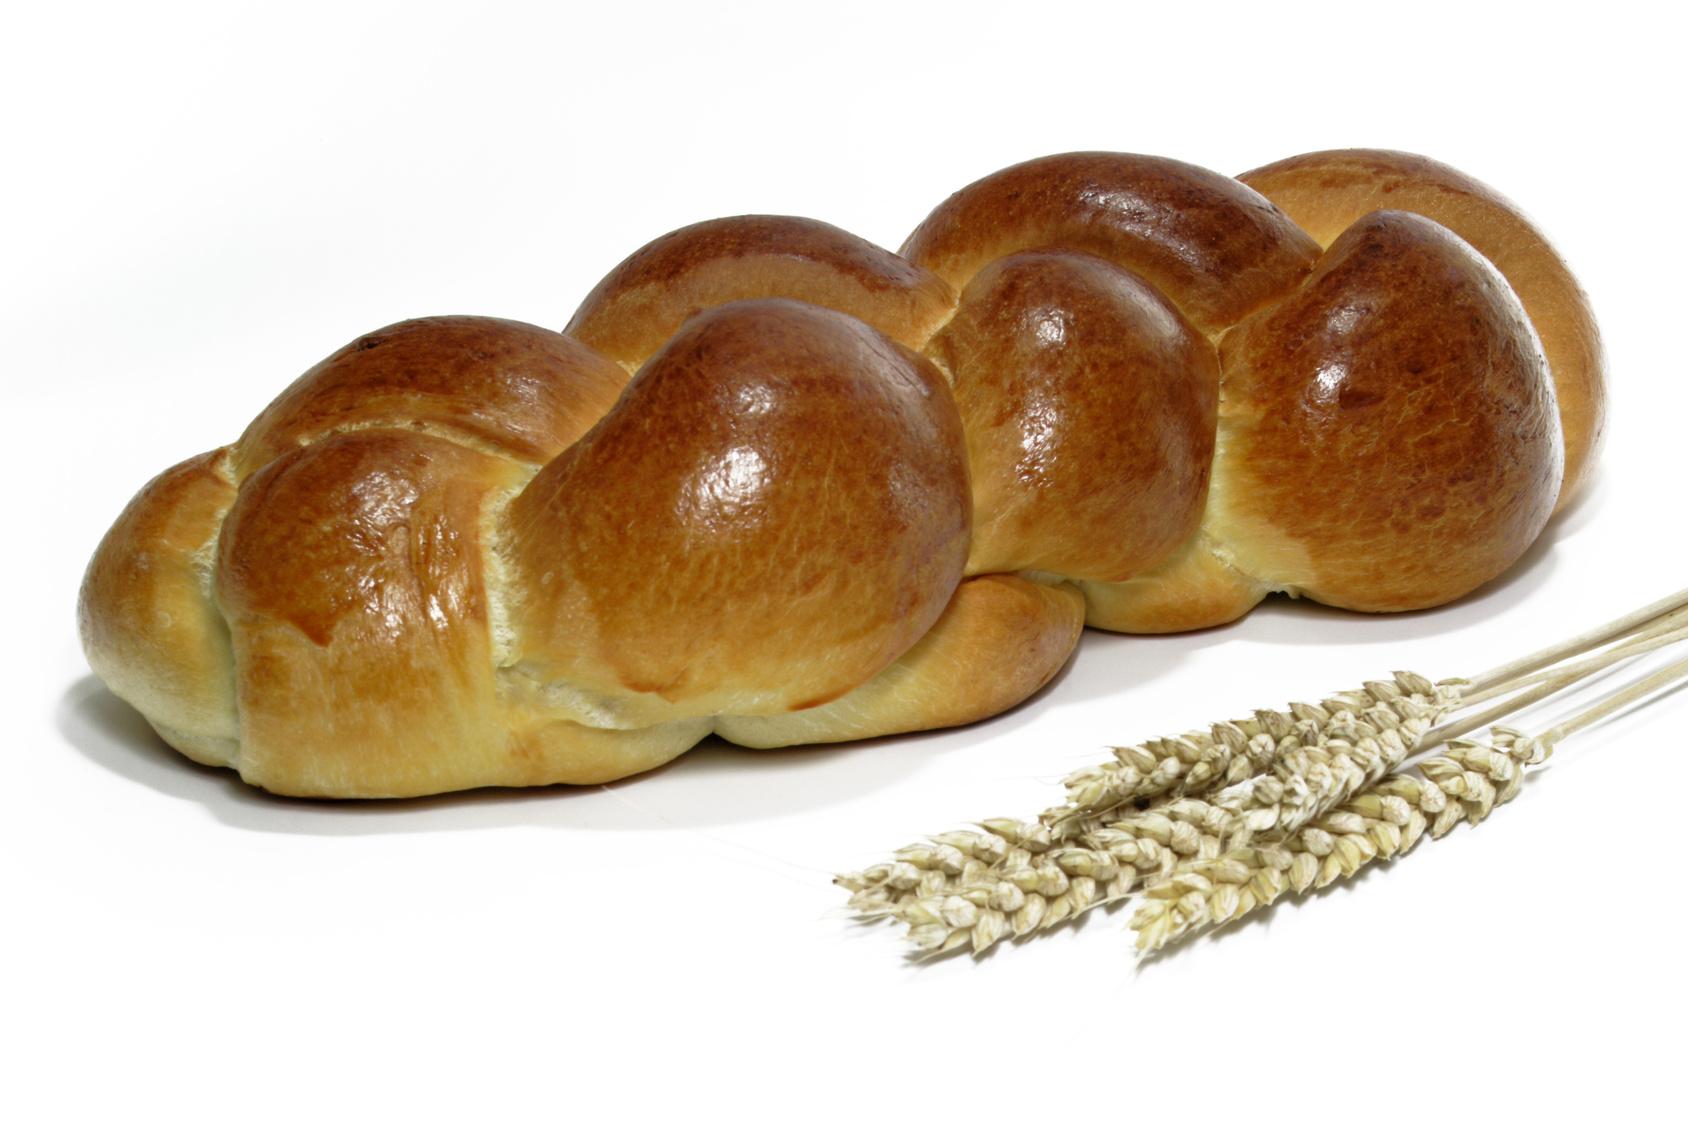 Challa koscher kosher bakery